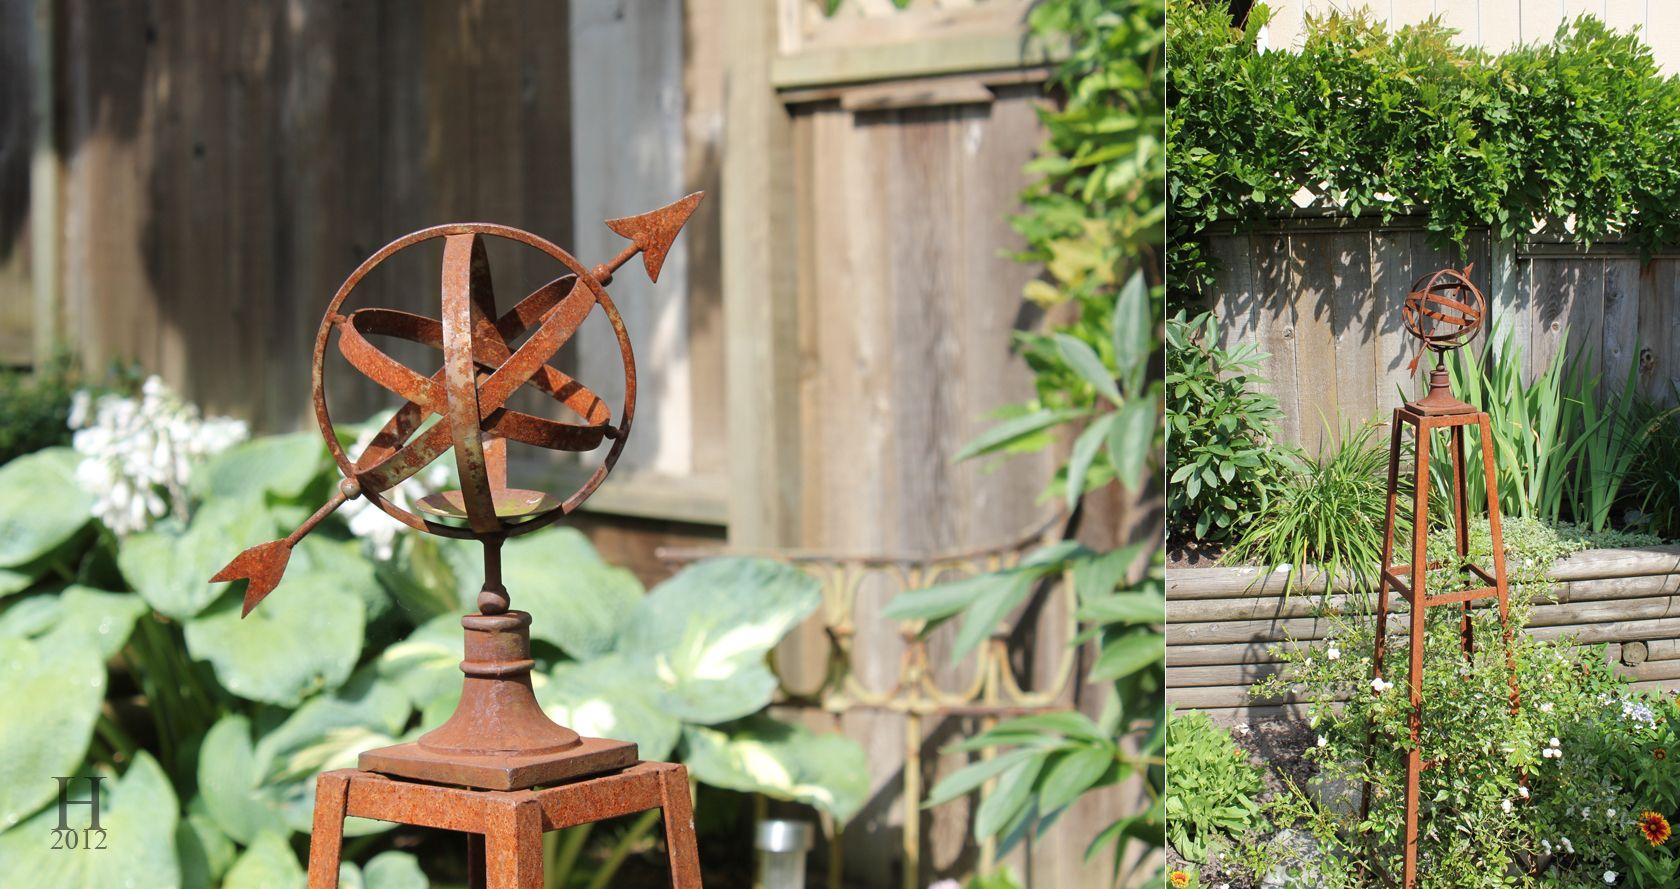 outdoor metal decor | Garden | Pinterest | Gardens, Garden junk and ...